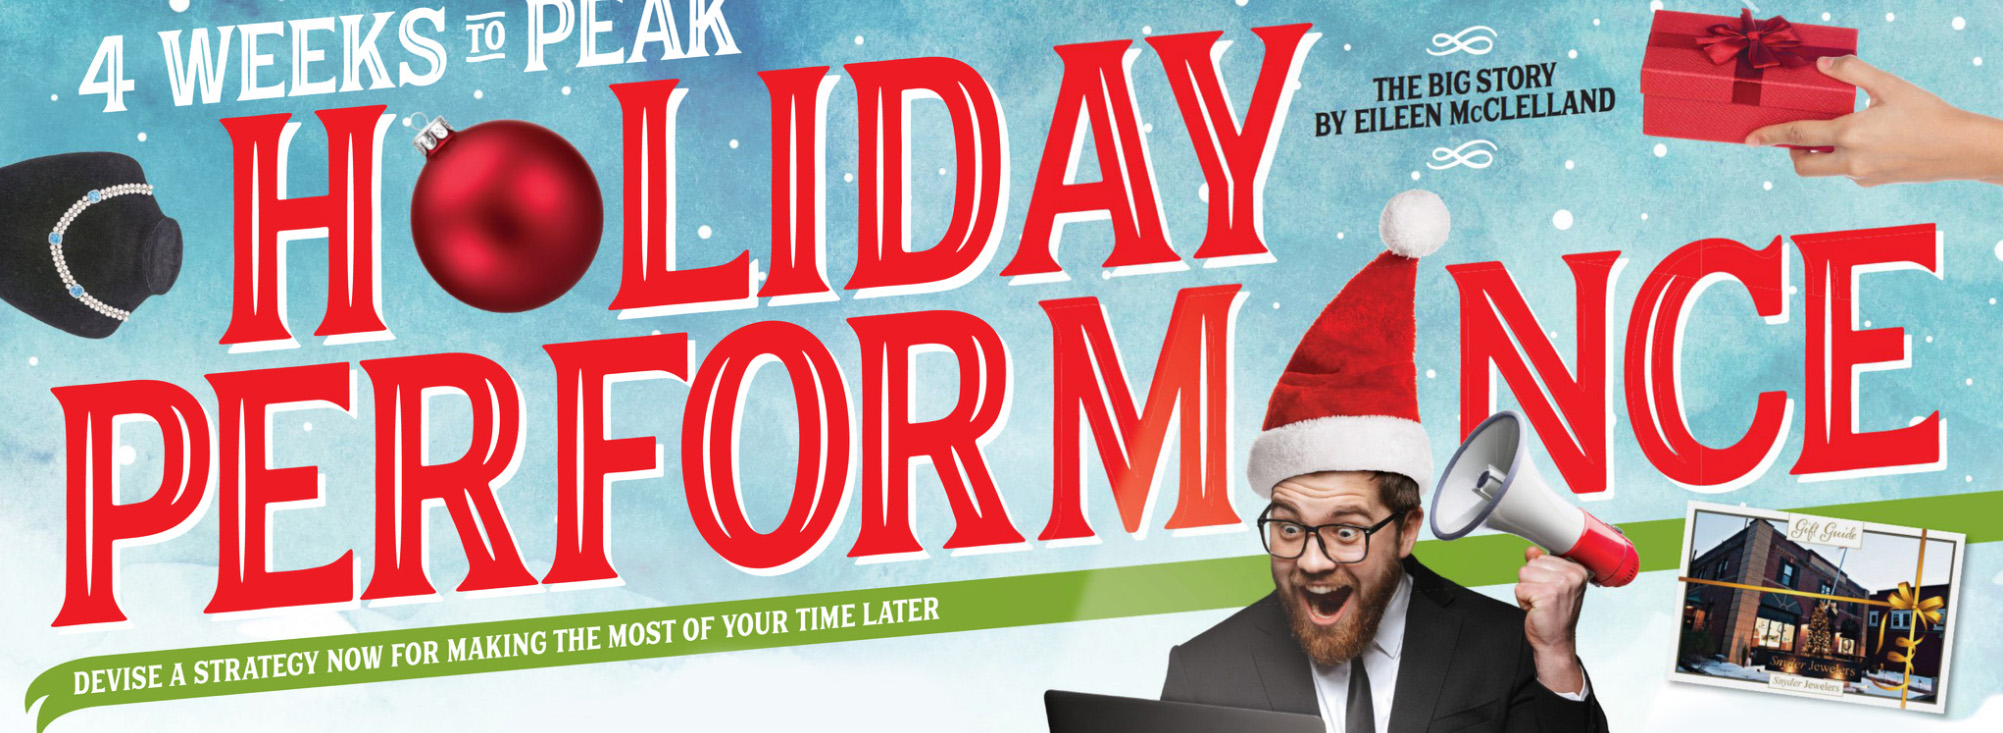 4 Weeks to Peak Holiday Performance